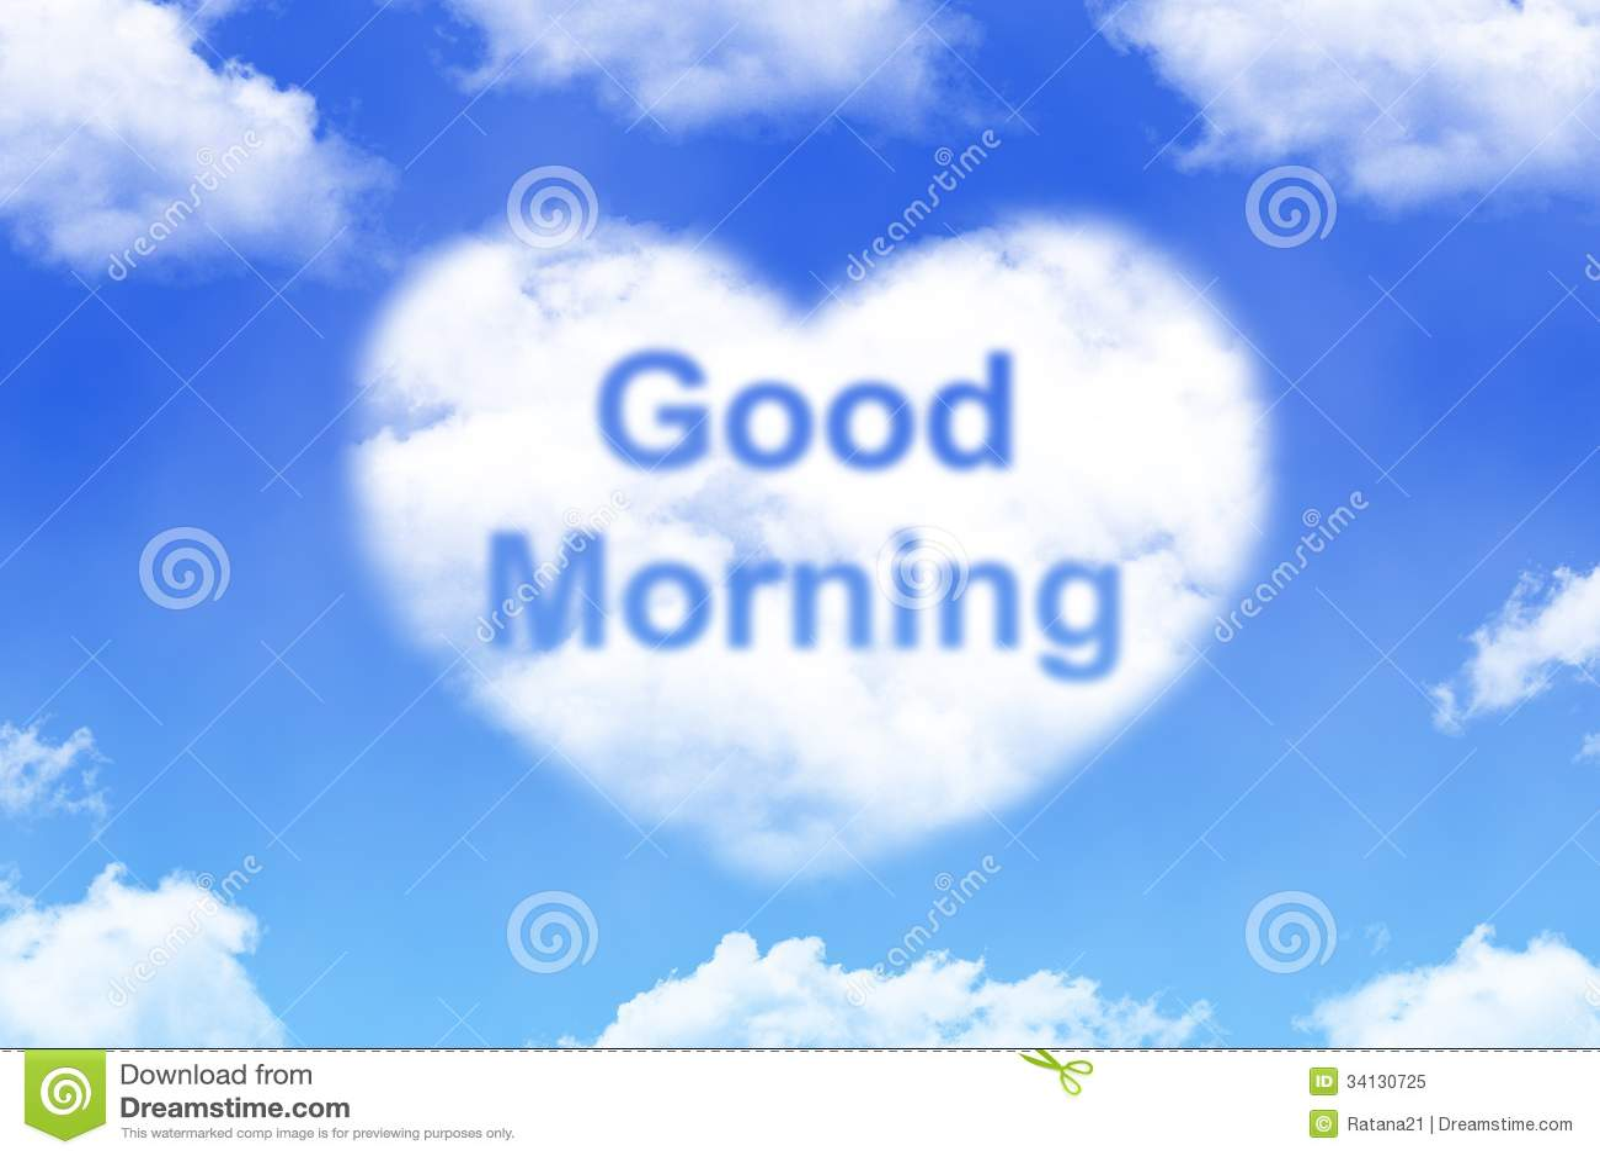 Good morning - cloud word